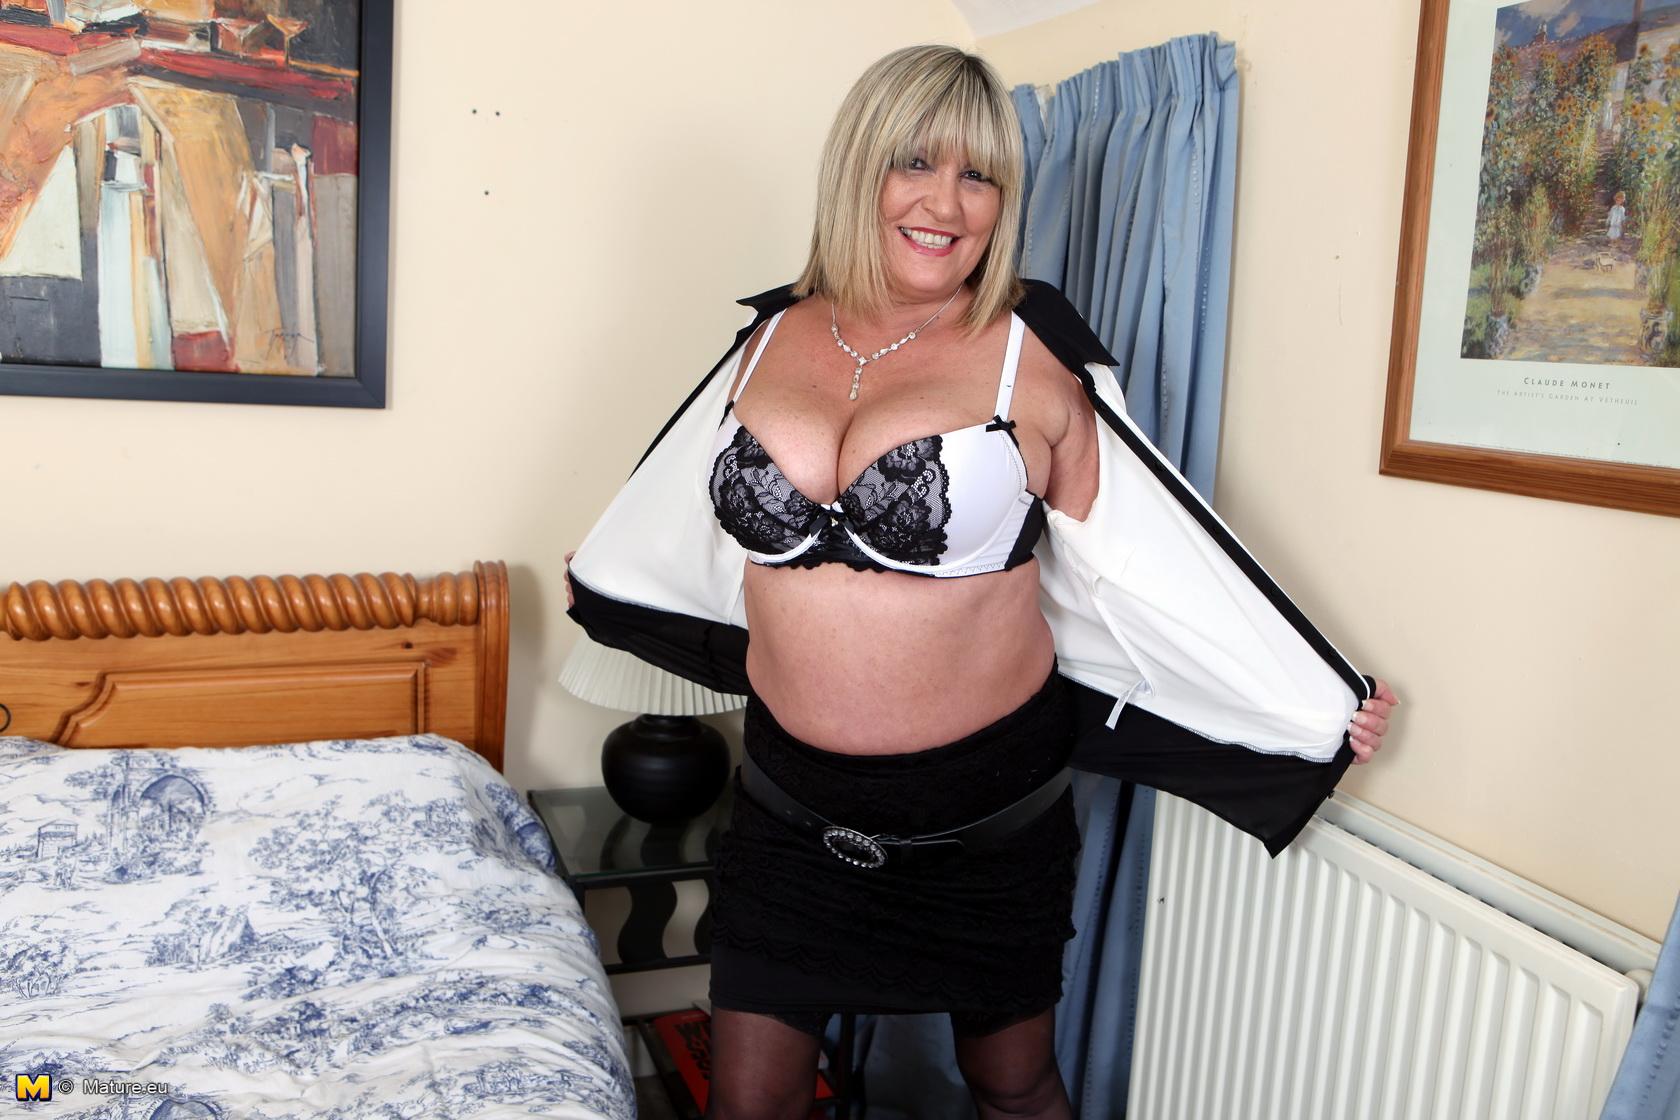 Big Tits British Mature Porn - Big breasted British mature lady getting naughty